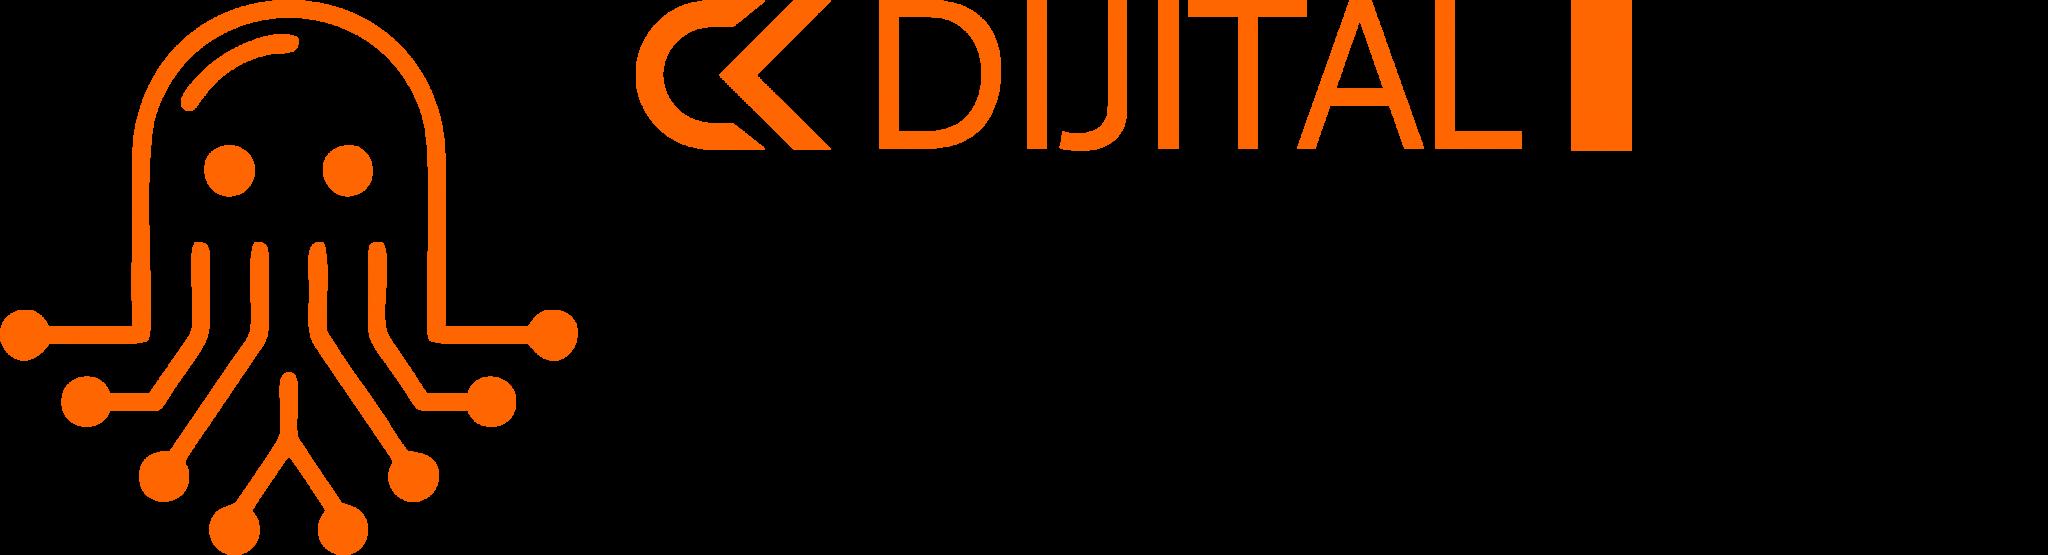 CK-DIJITAL-post-yatay-norm